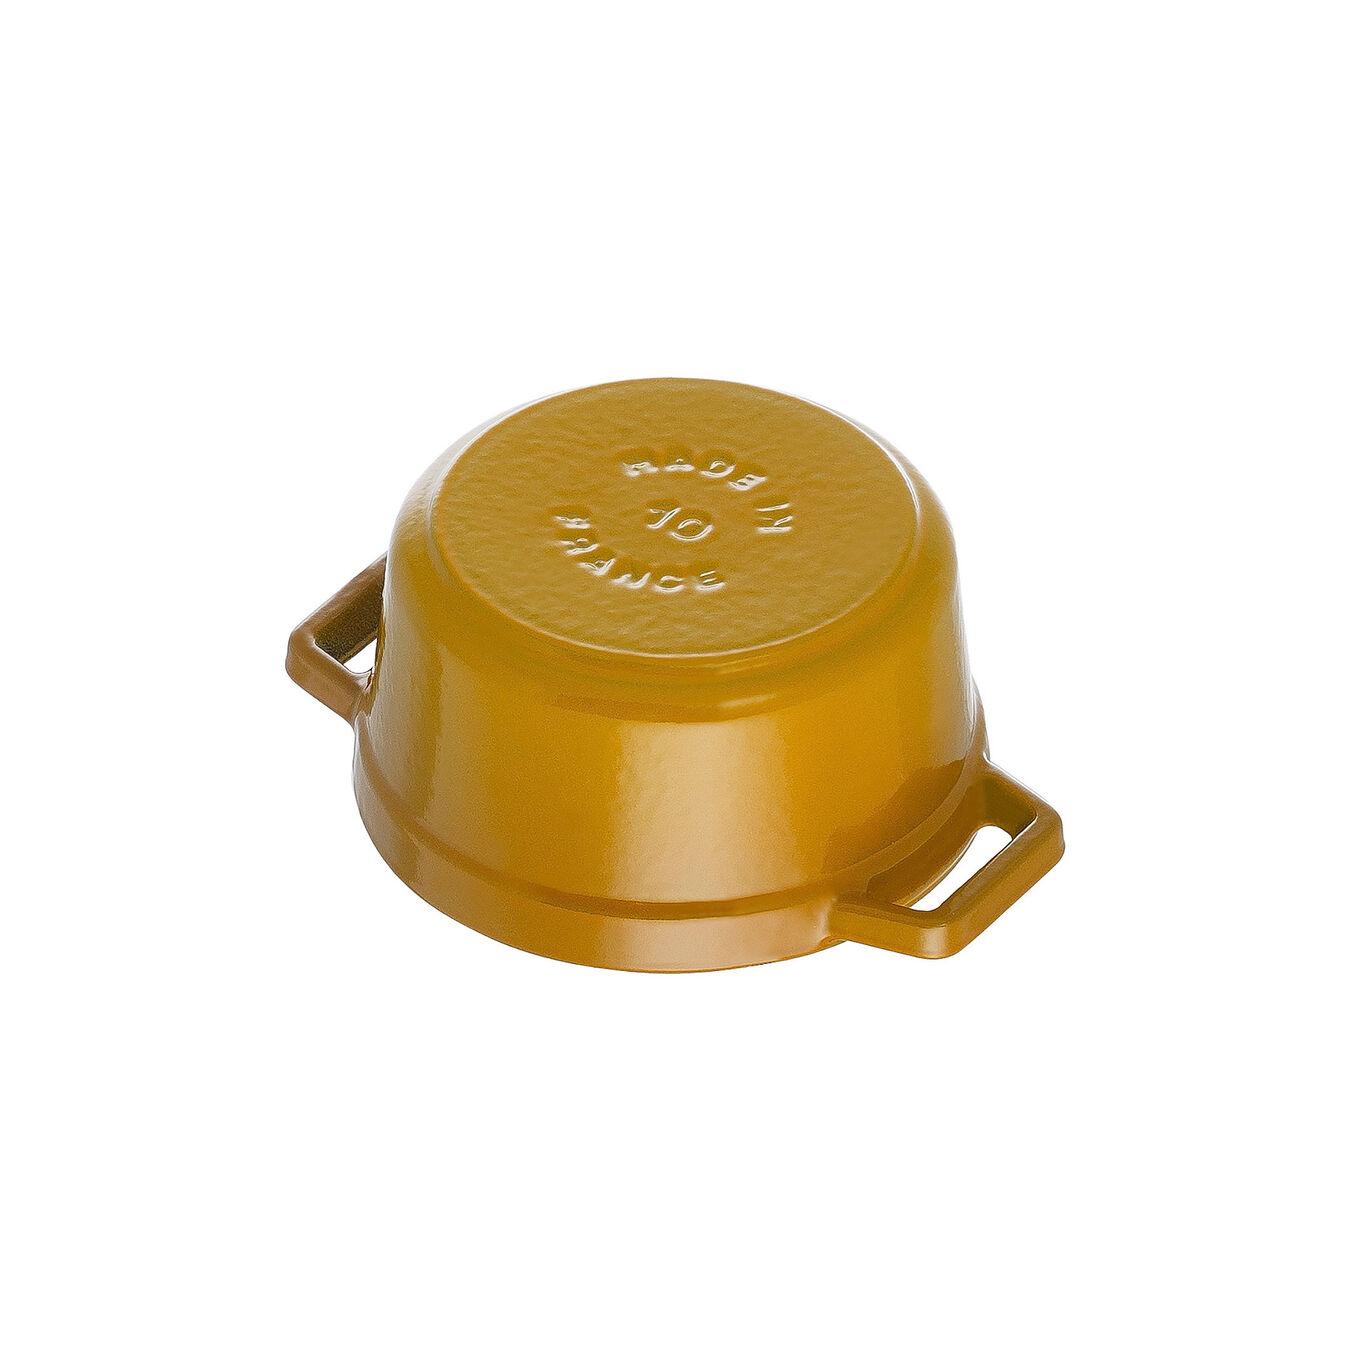 Mini Cocotte 10 cm, rund, Senf, Gusseisen,,large 4